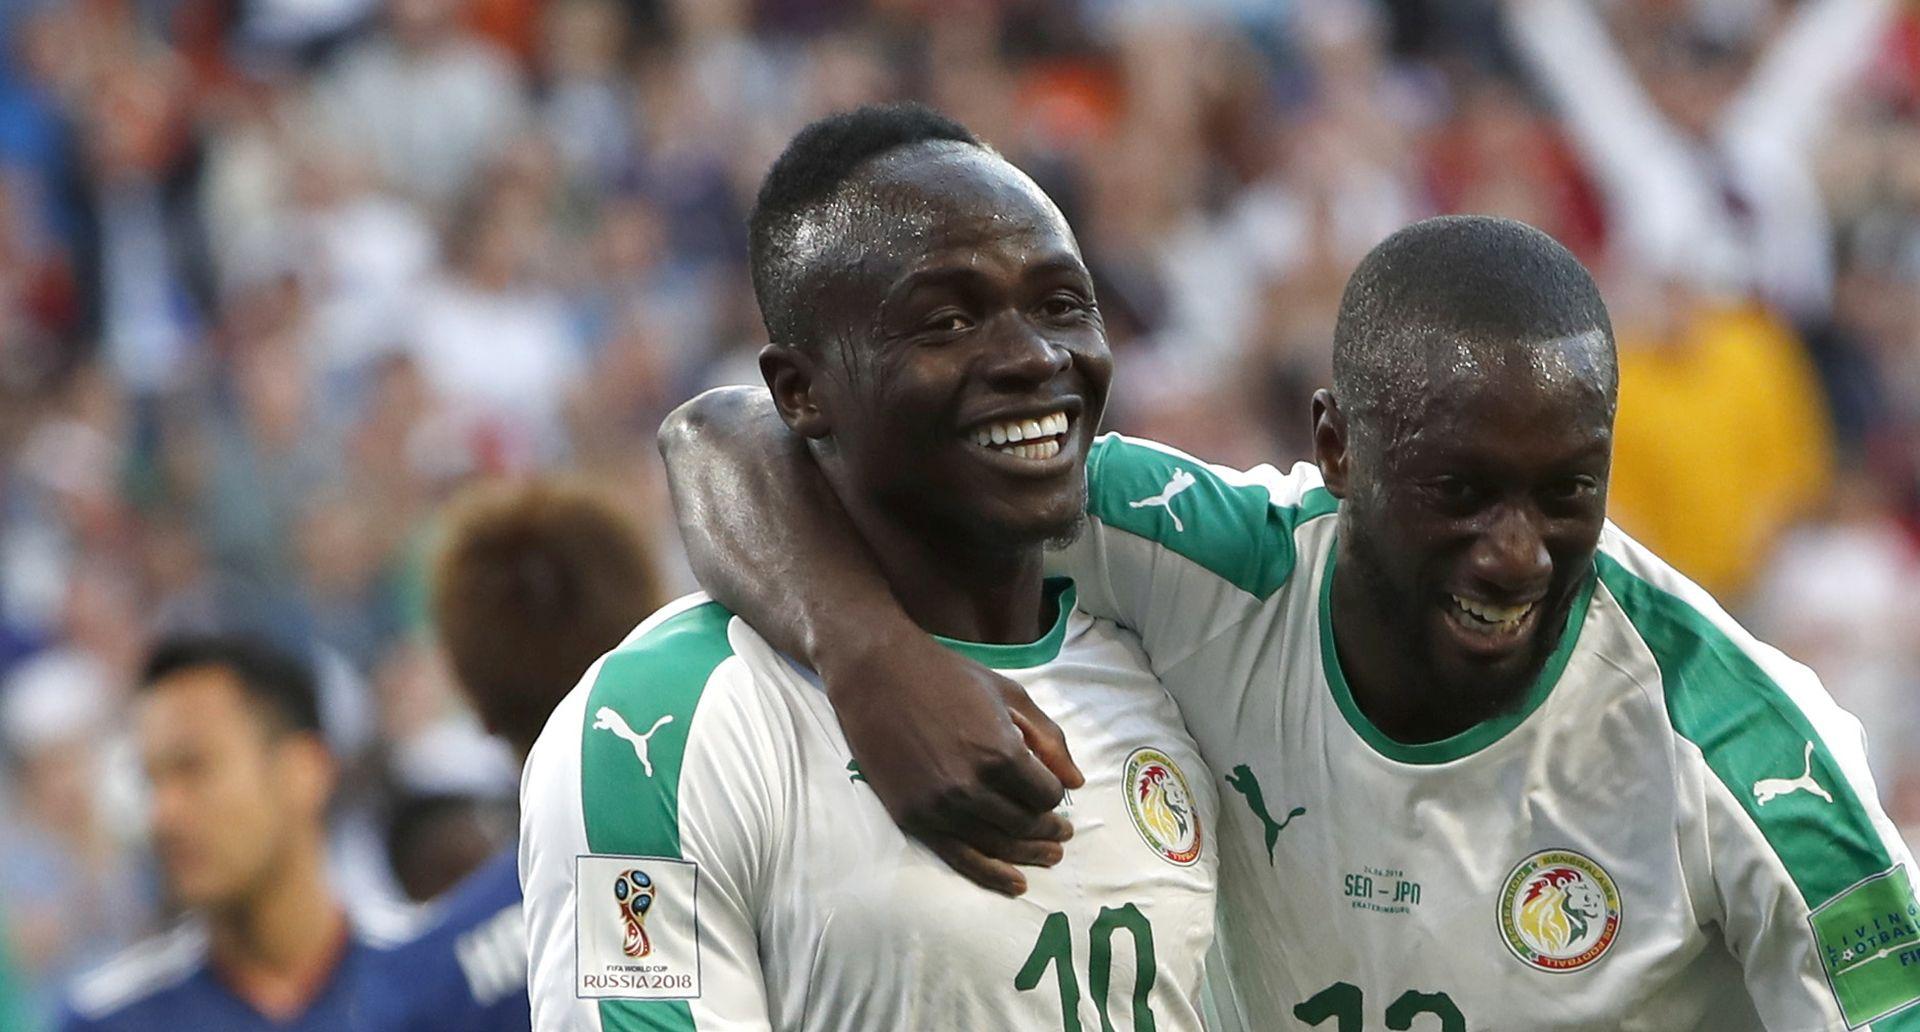 Senegal dva puta vodio, ali Japan ipak stigao do remija